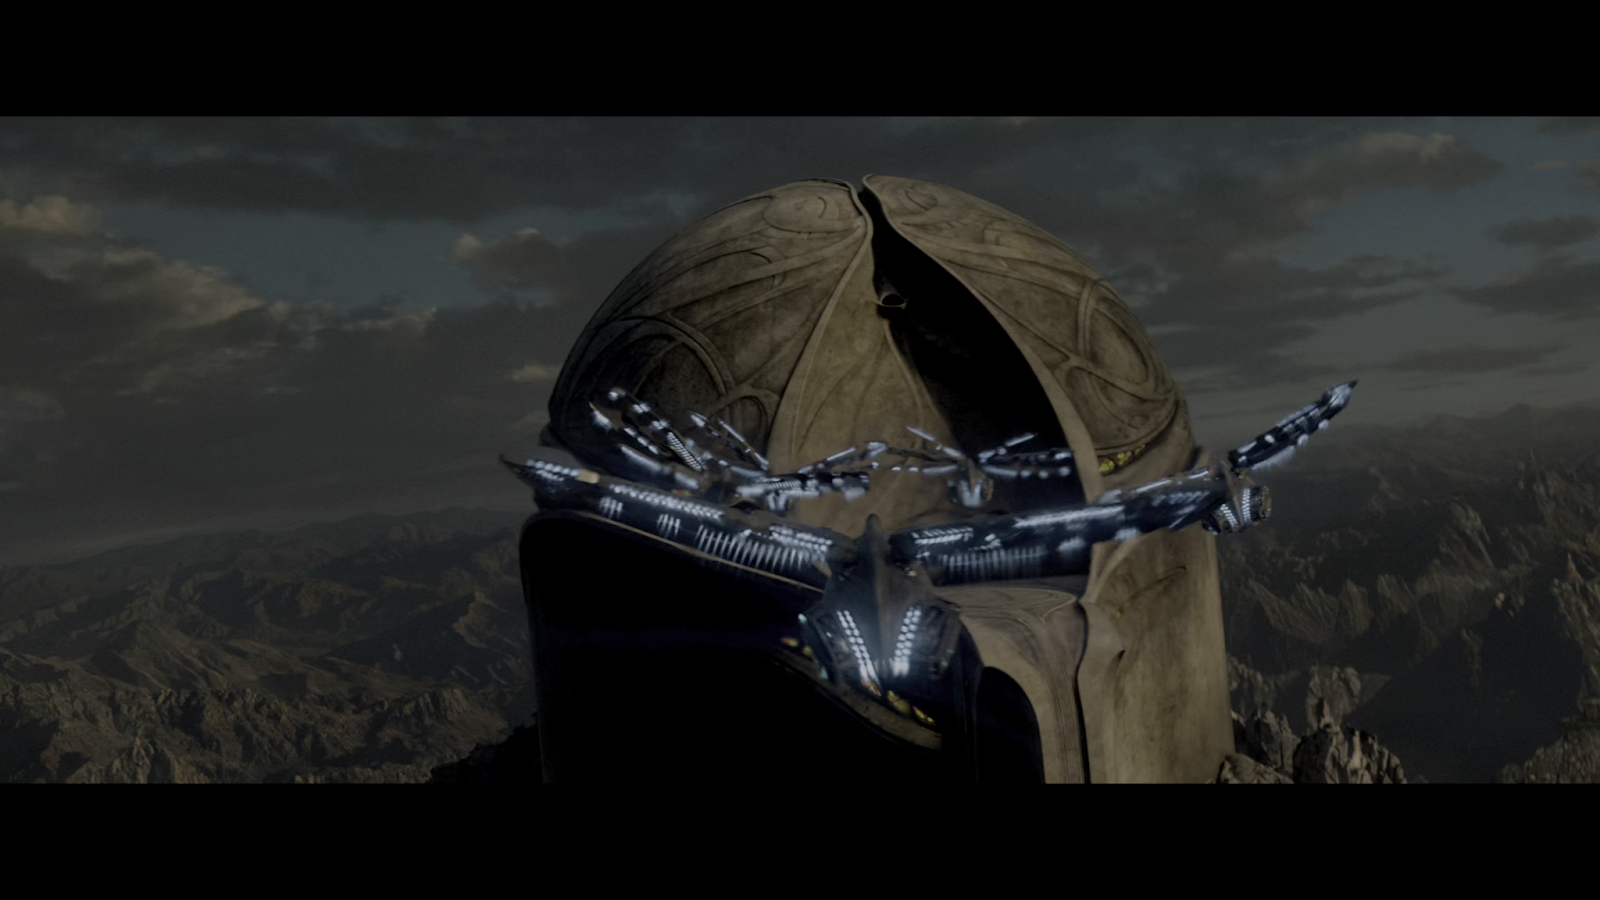 El Hombre de Acero (2013) 4K UHD [HDR] Latino-Castellano-Ingles captura 1